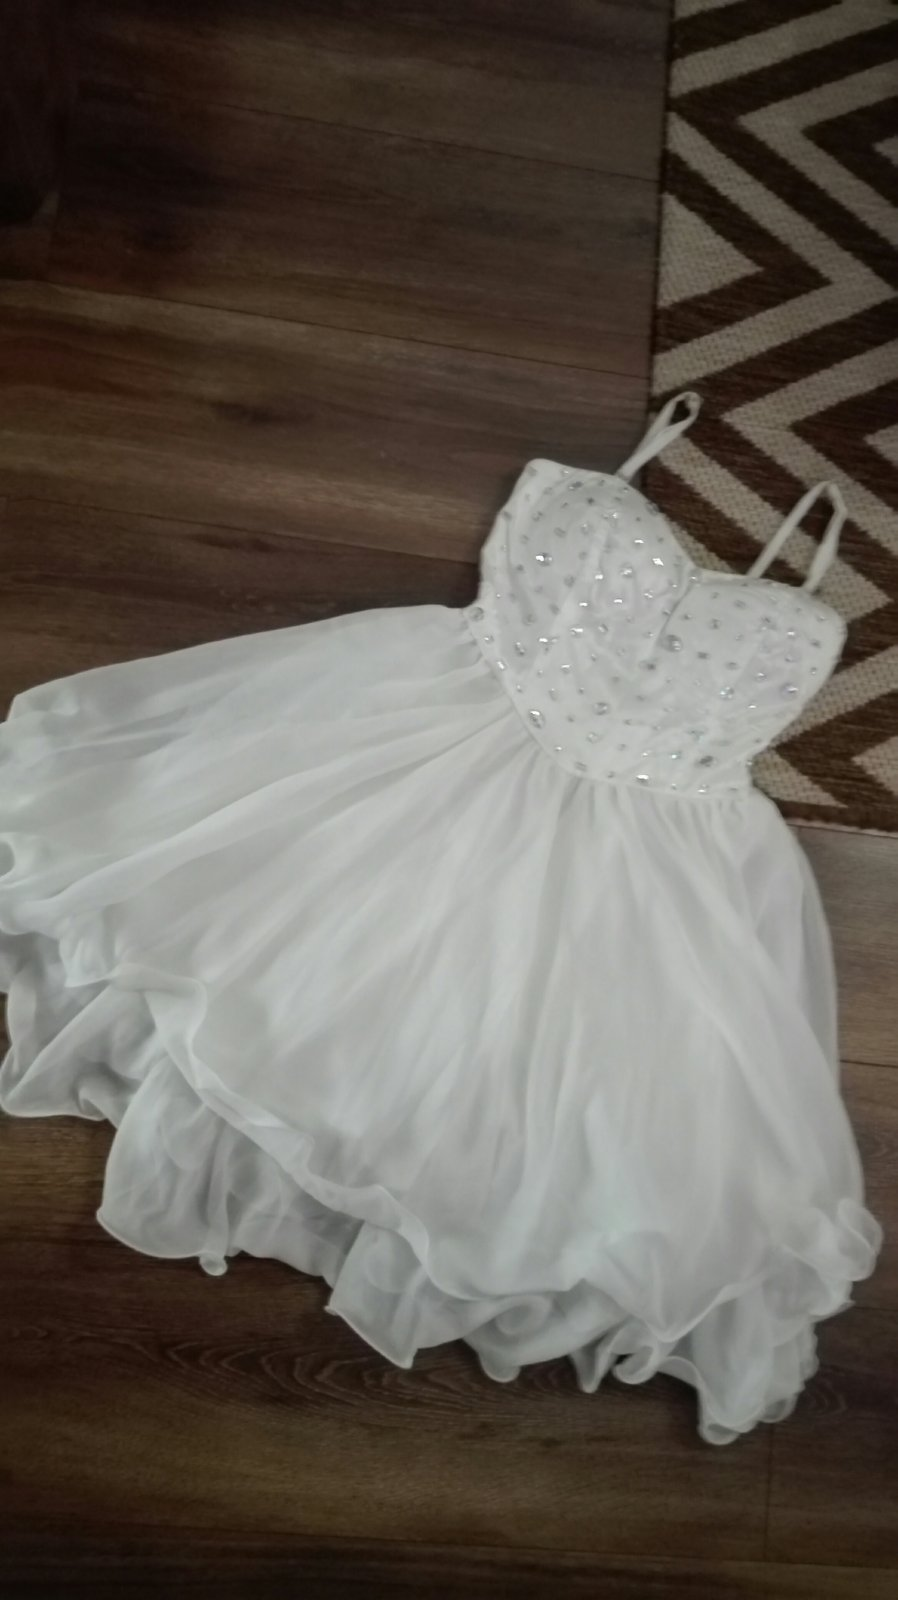 biele šaty - Obrázok č. 1